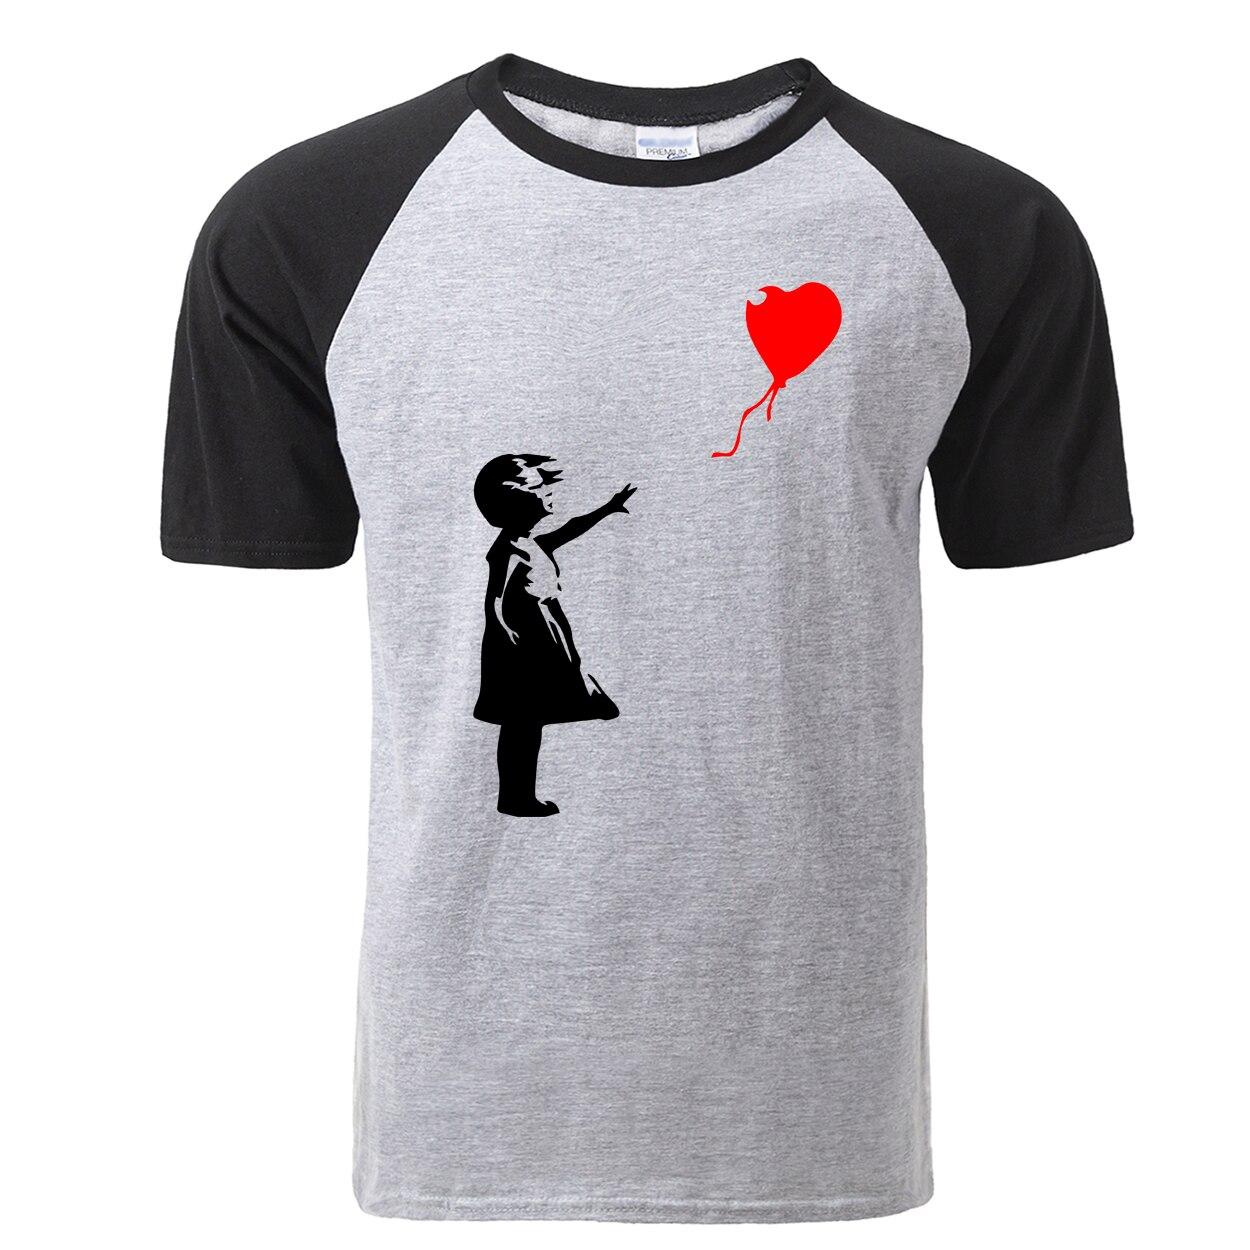 Fashion Banksy T Shirts Men 2019  Funny Float Balloon Girl T-Shirt Casual Cotton Men Short Sleeve Tshirt Soft Raglan Tops Tees